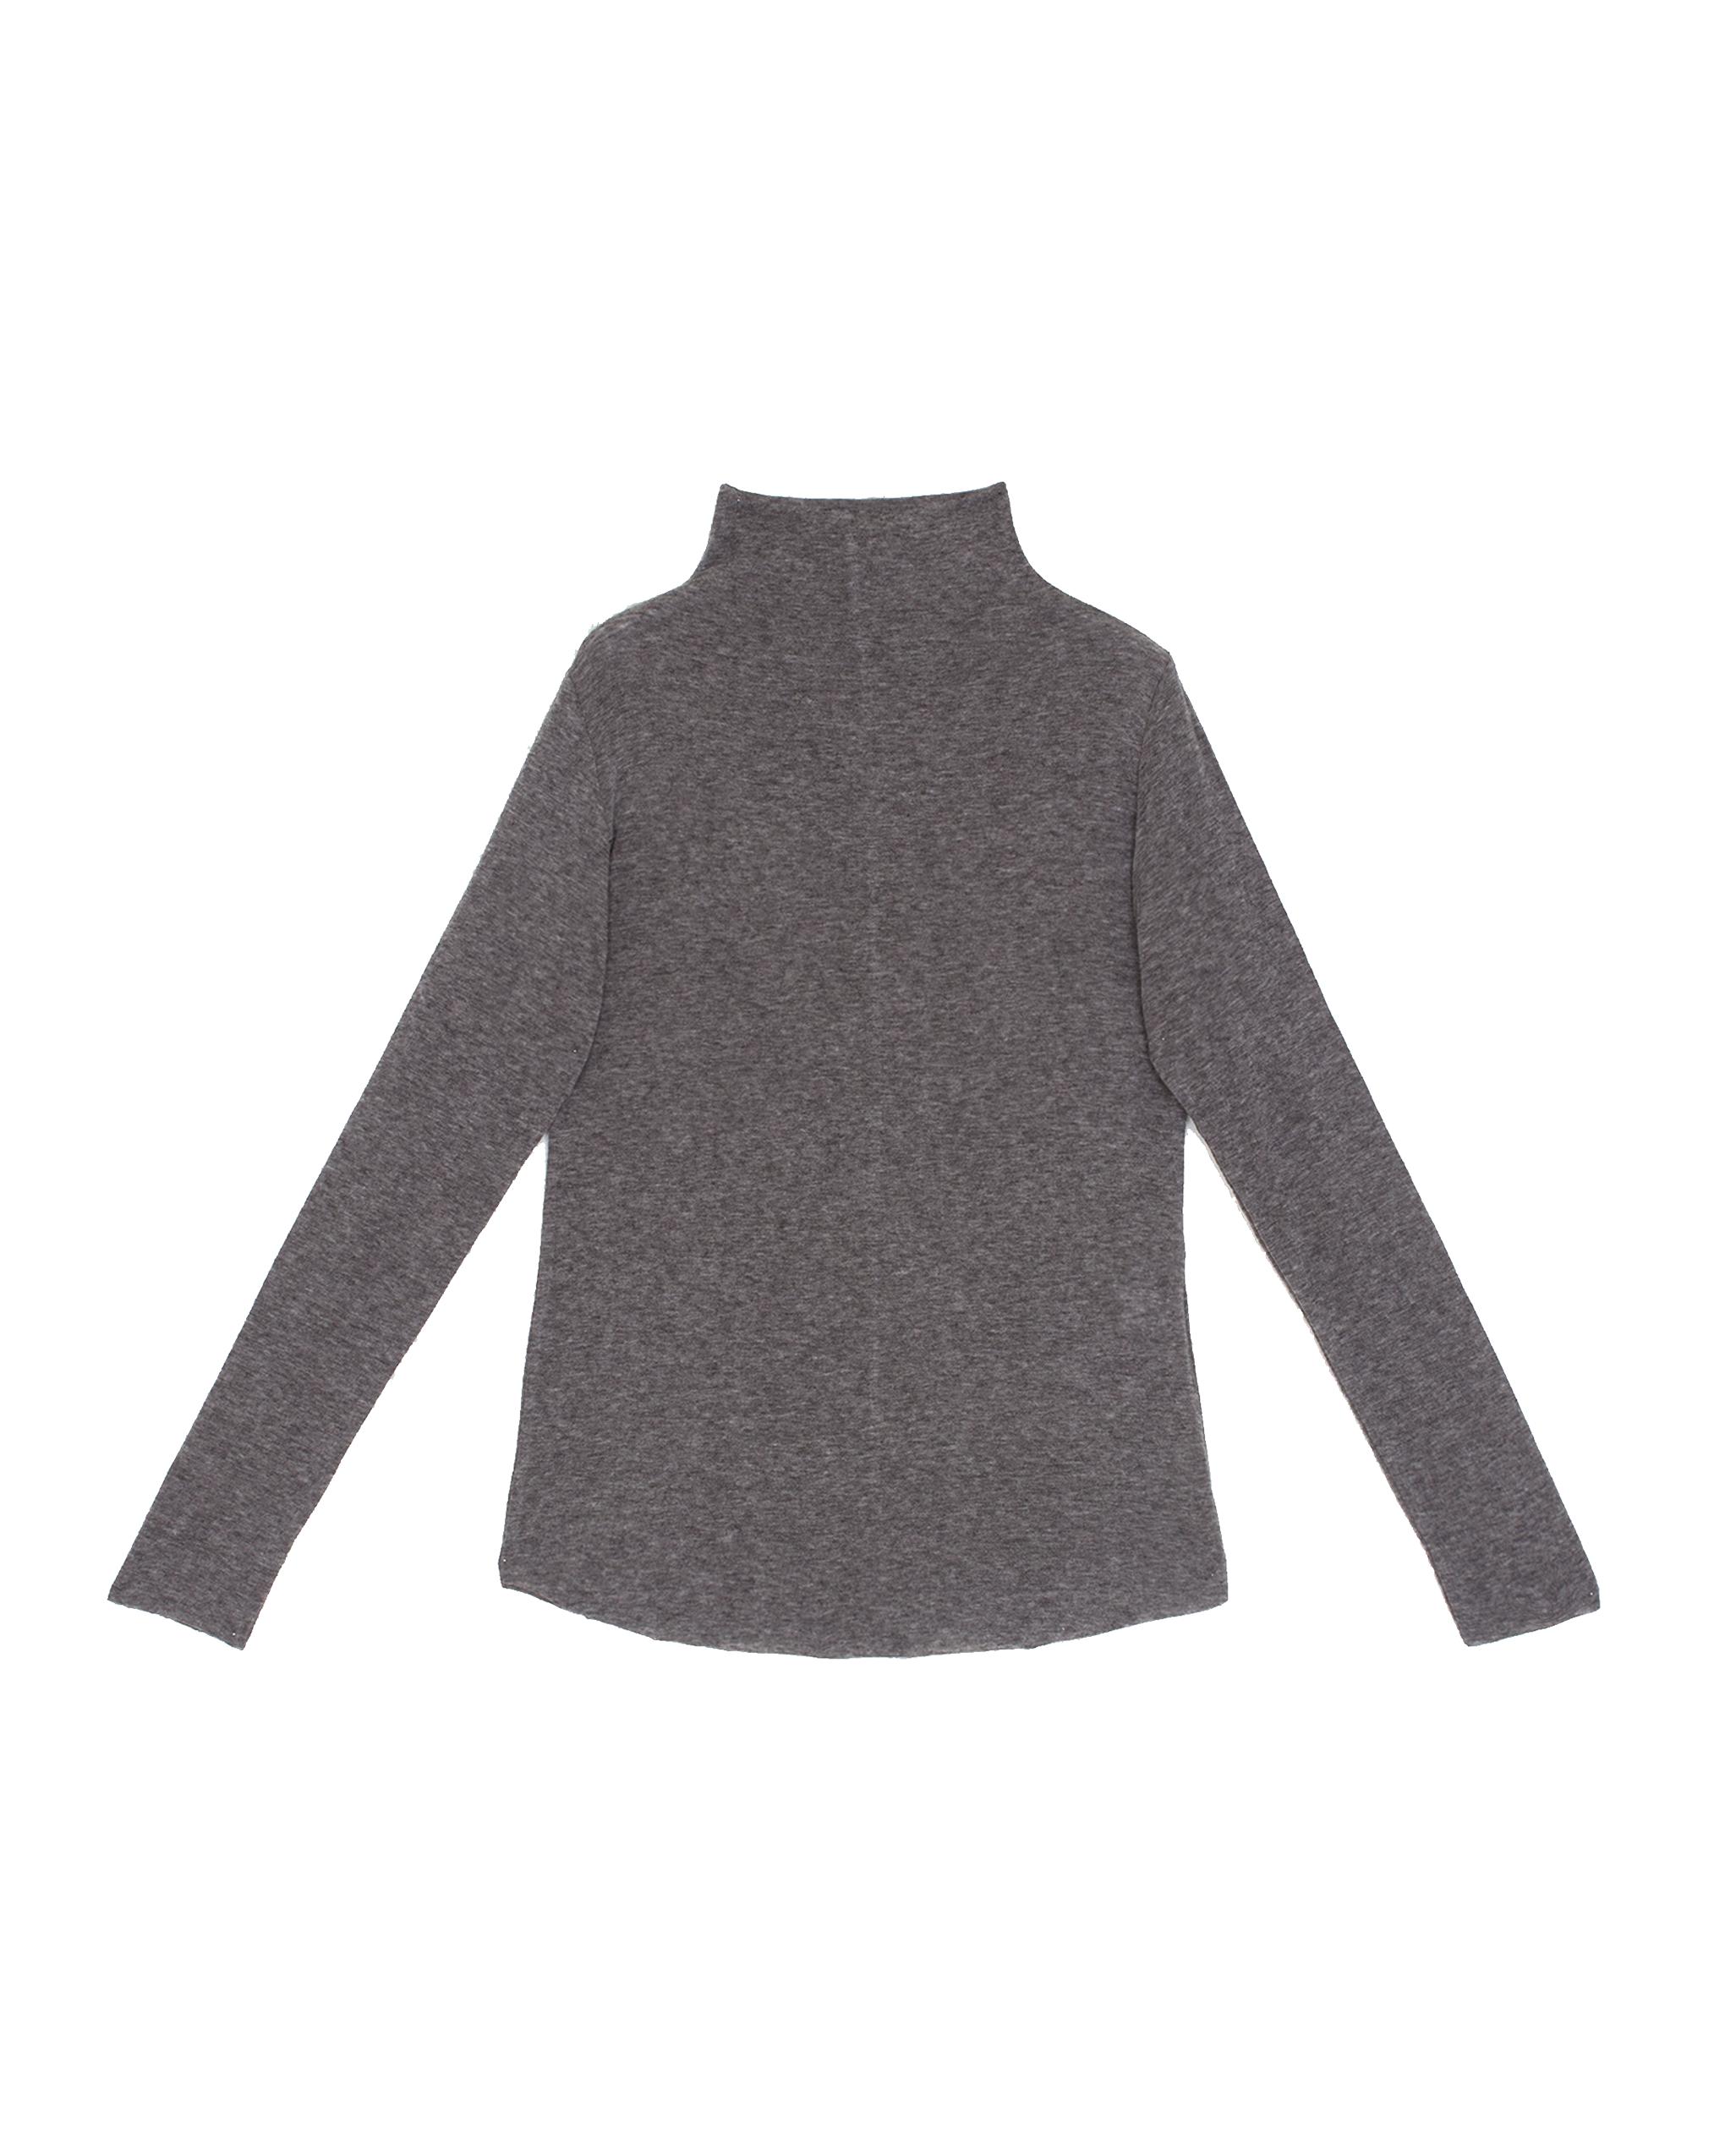 EMIN + PAUL charcoal second skin wool blouse.